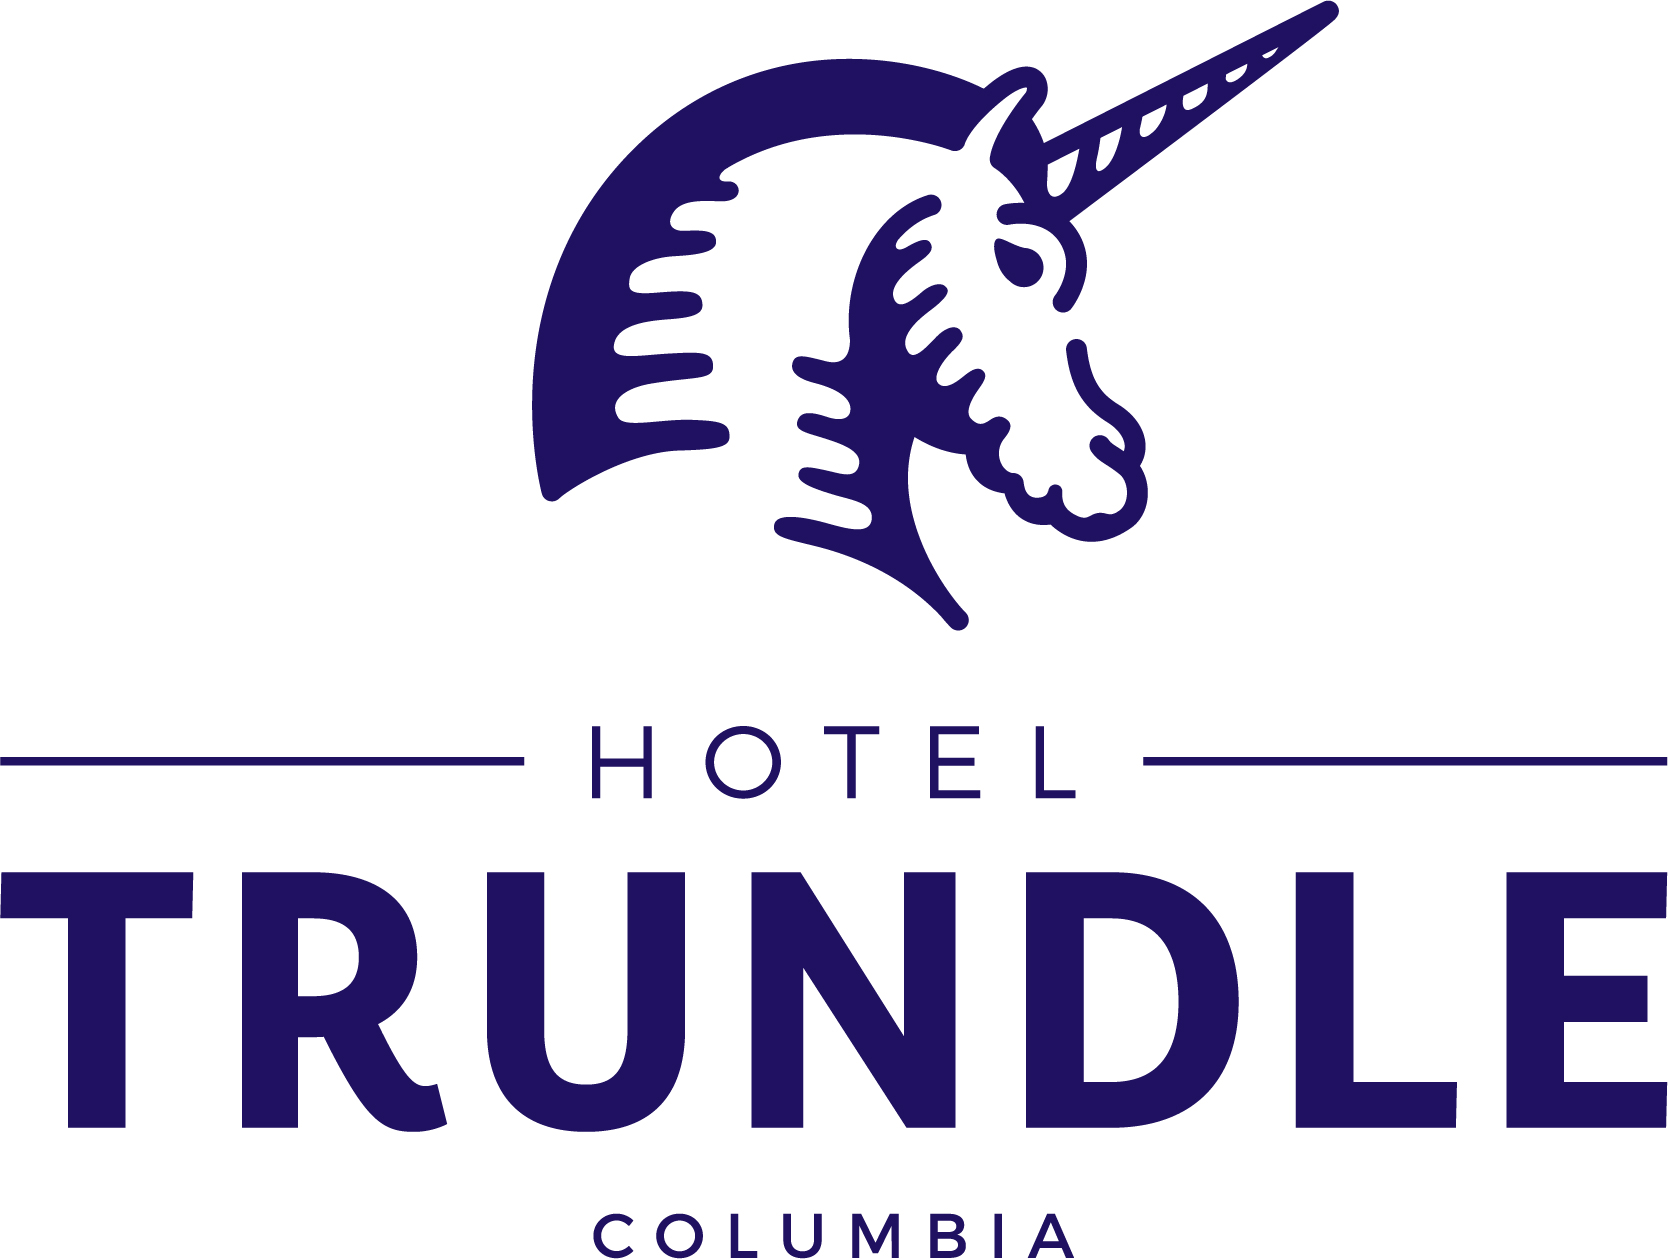 TRUNDLE-logo-2755c.jpg